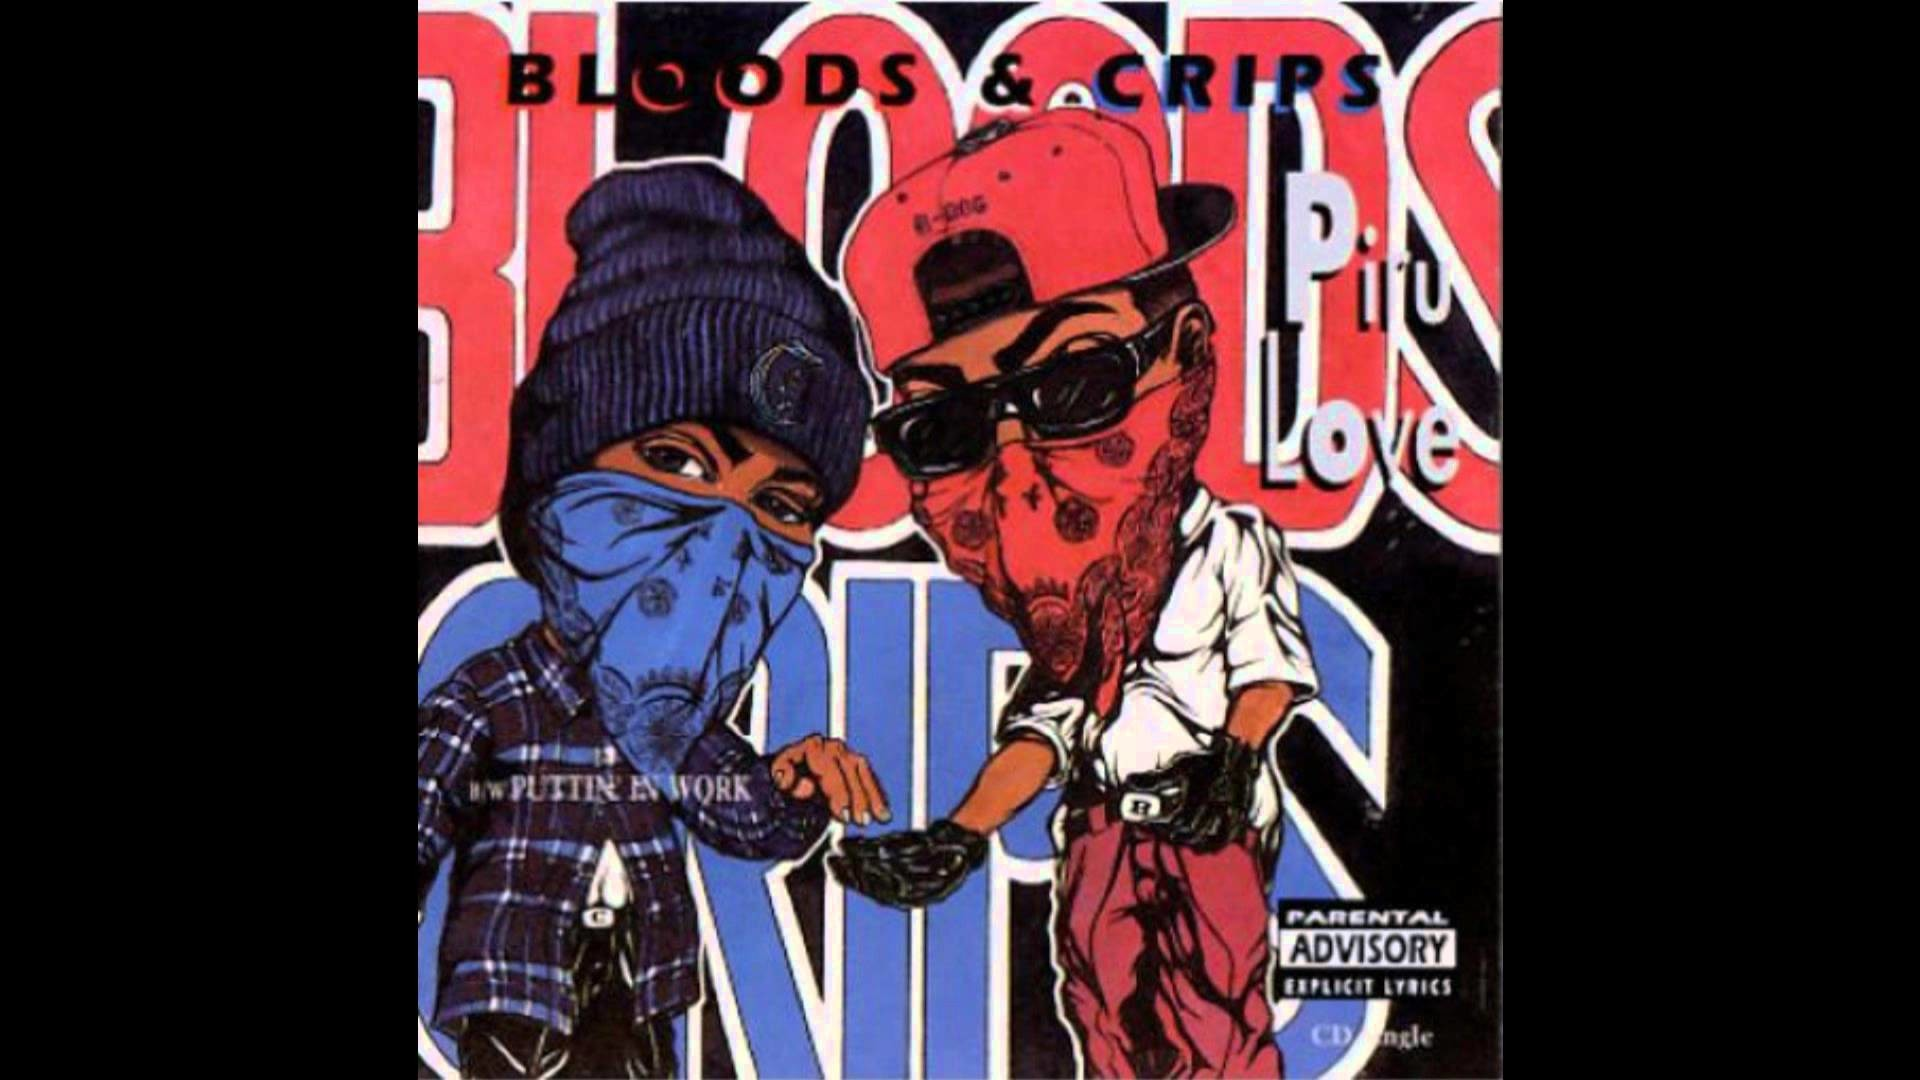 Res: 1920x1080, Bloods & Crips - Piru Love (Original Version)